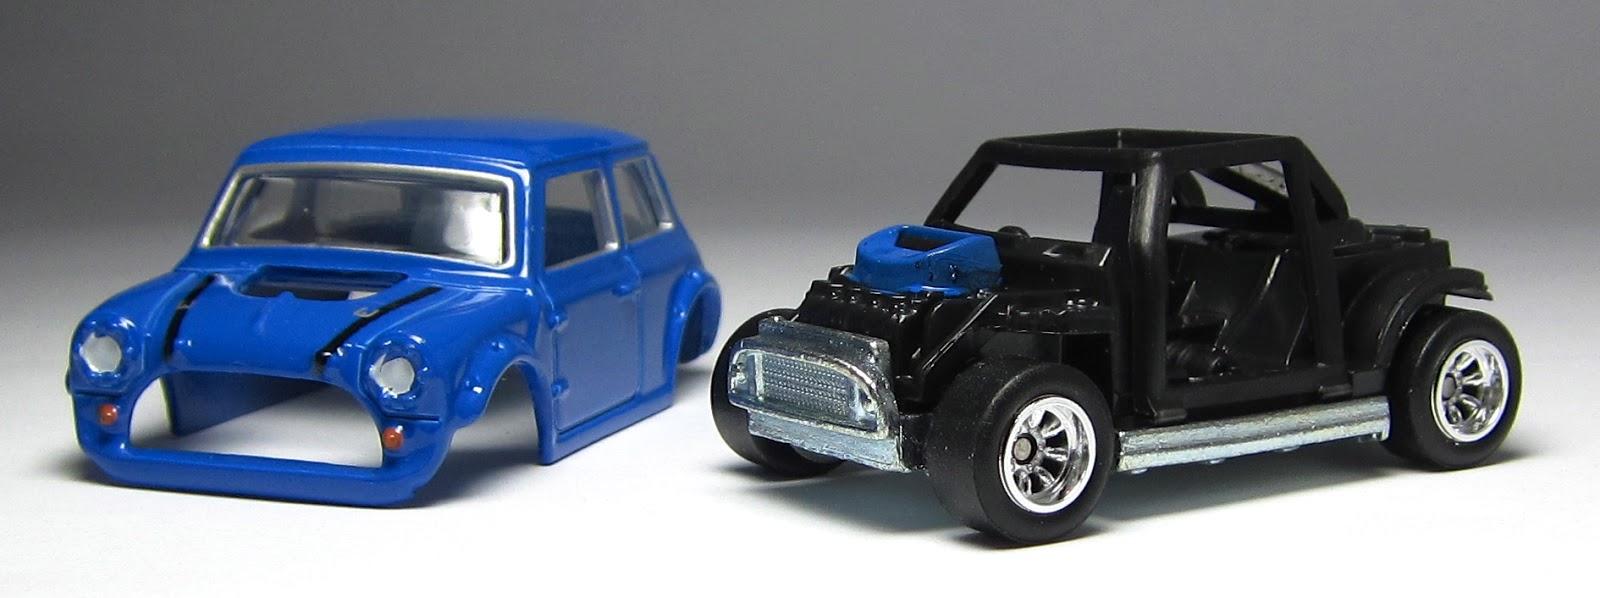 First Look Hot Wheels Retro Entertainment Morris Mini Thelamleygroup